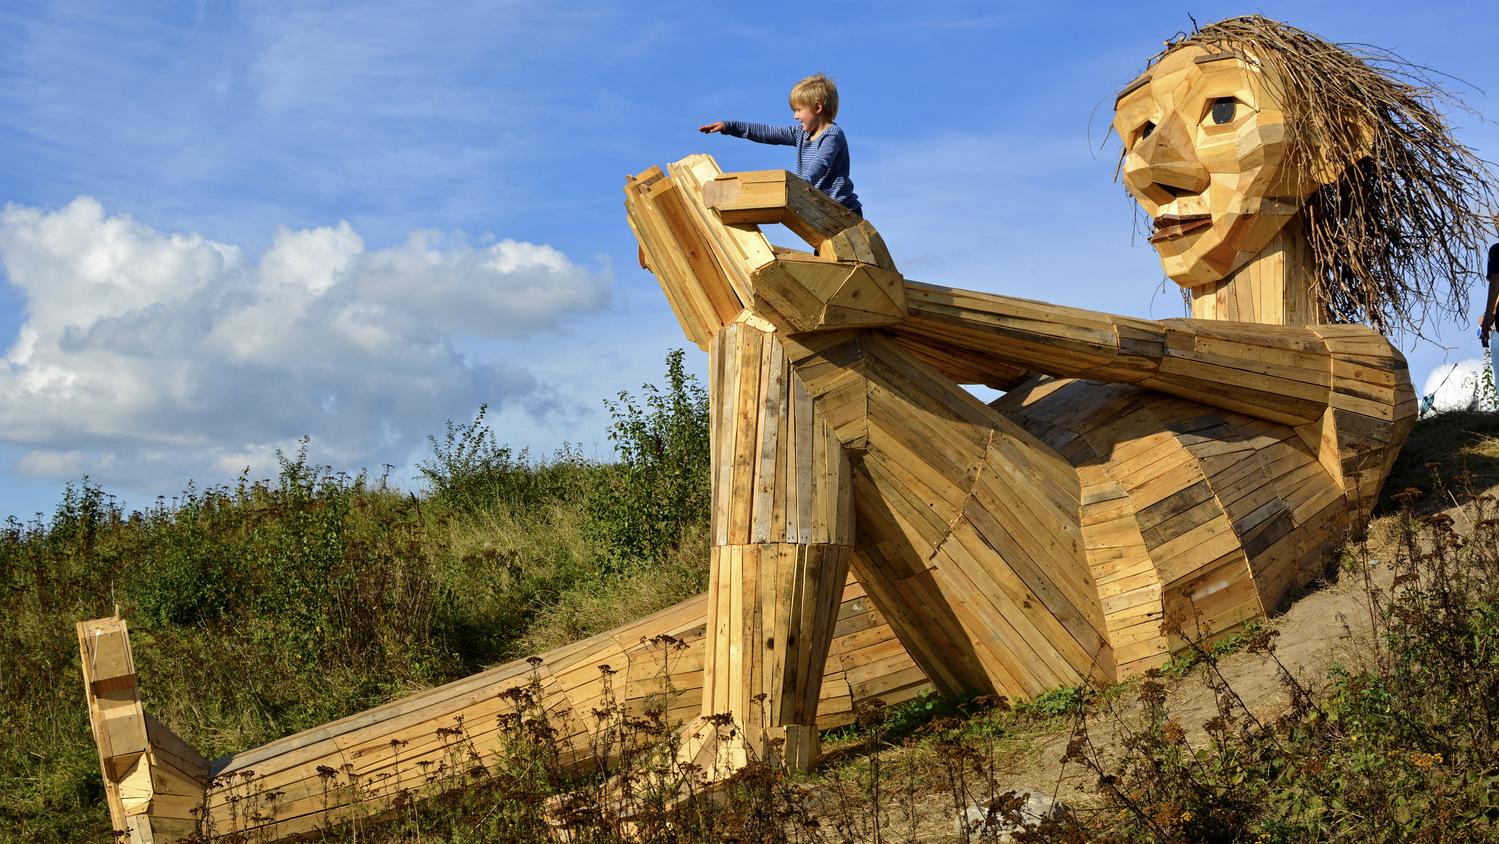 Image: A huge sculpture of a troll, 50 feet long, made of scrap wood.